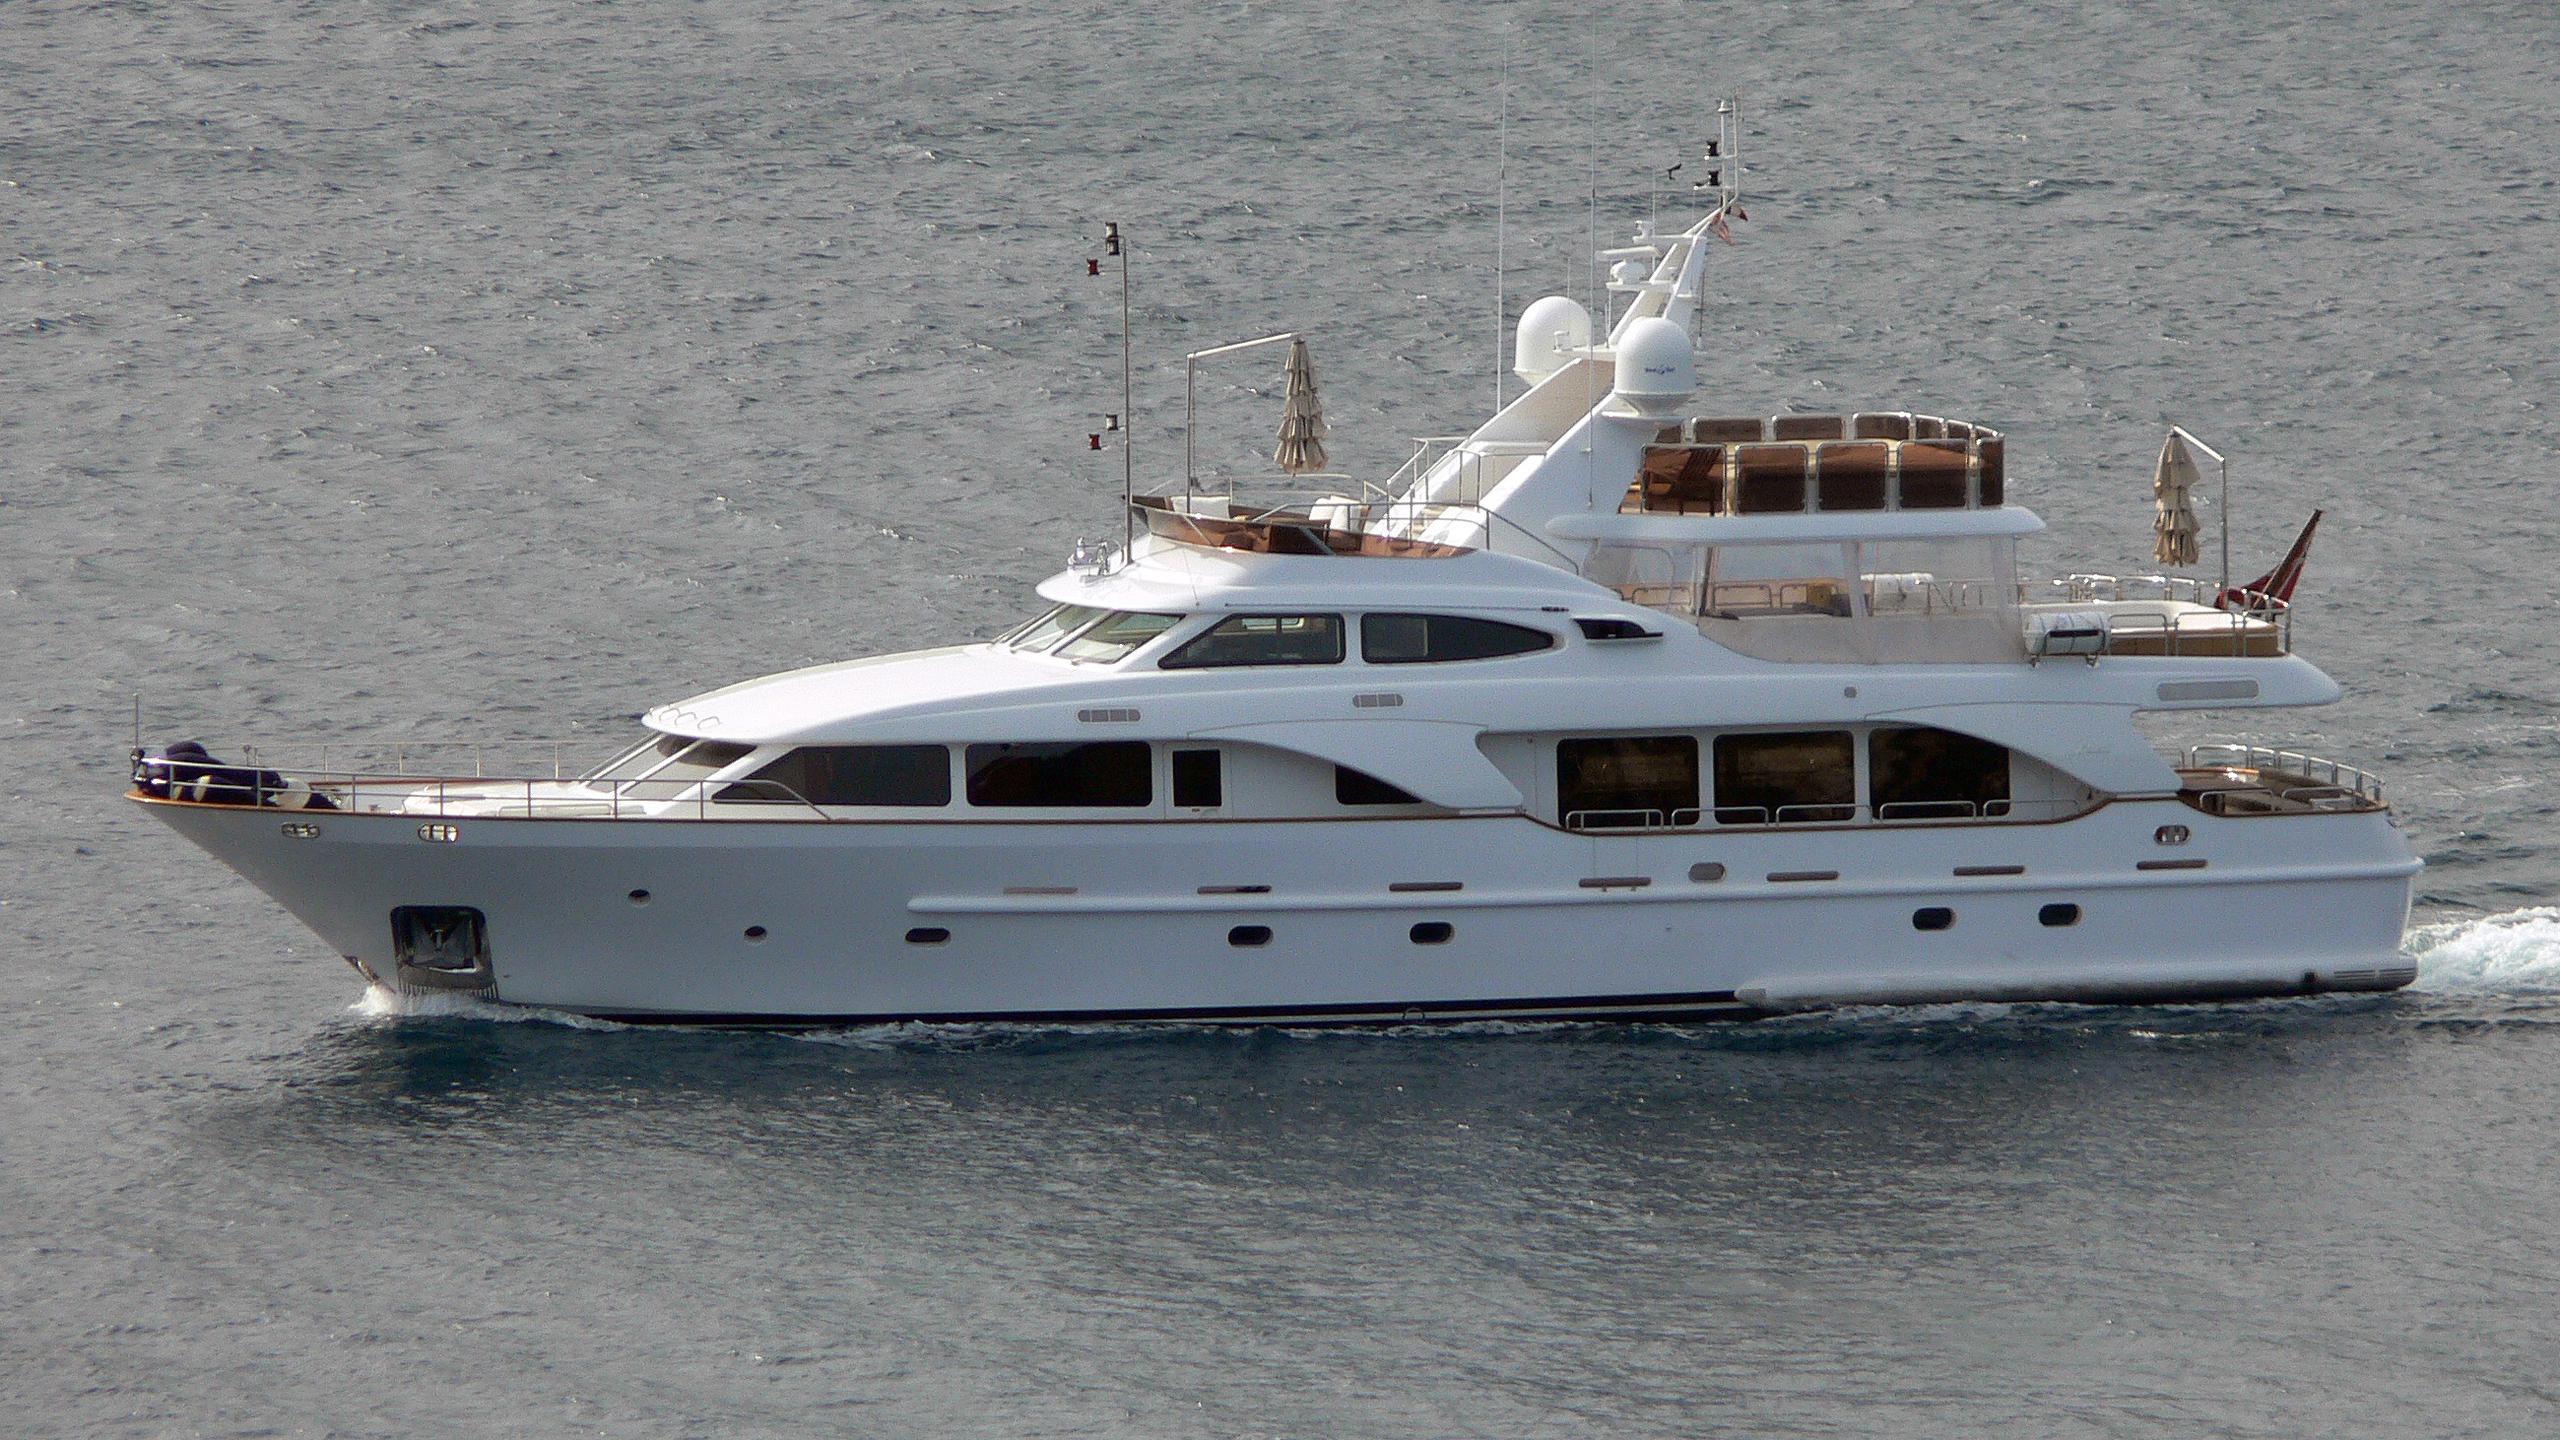 jazz-motor-yacht-benetti-tradition-2007-30m-aerial-profile